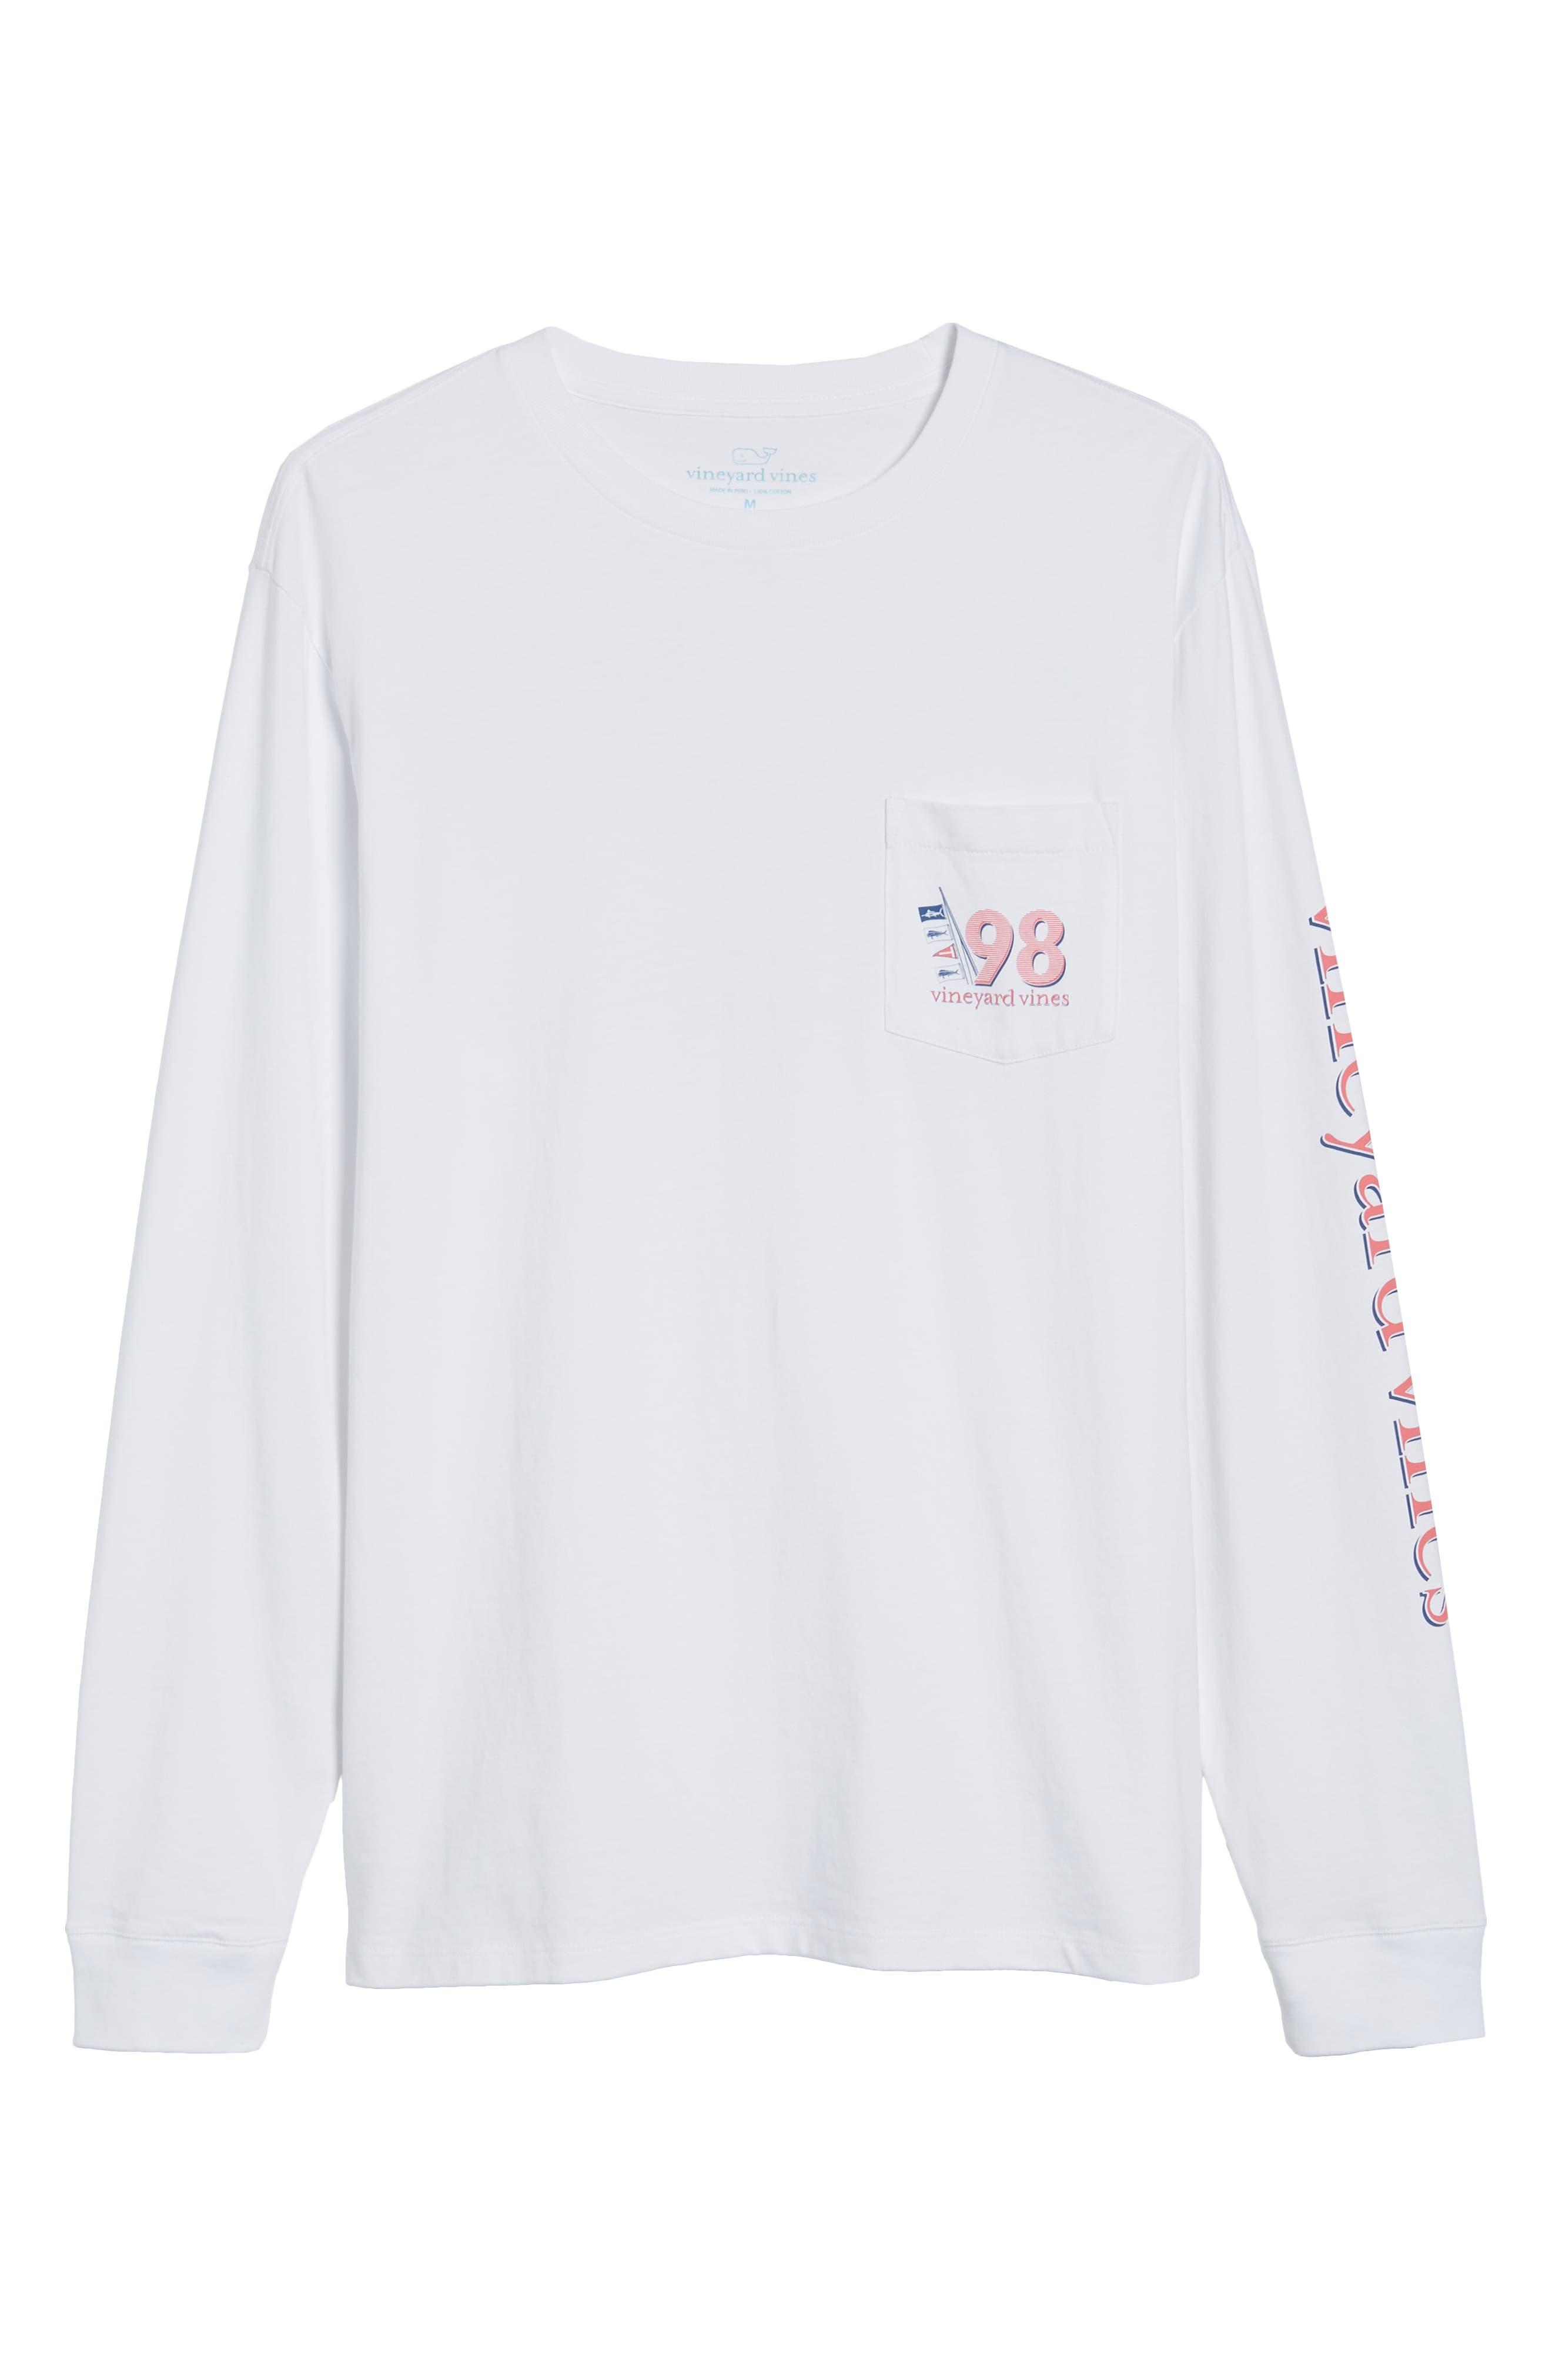 Sportfisher Regular Fit Crewneck T-Shirt,                             Alternate thumbnail 6, color,                             100